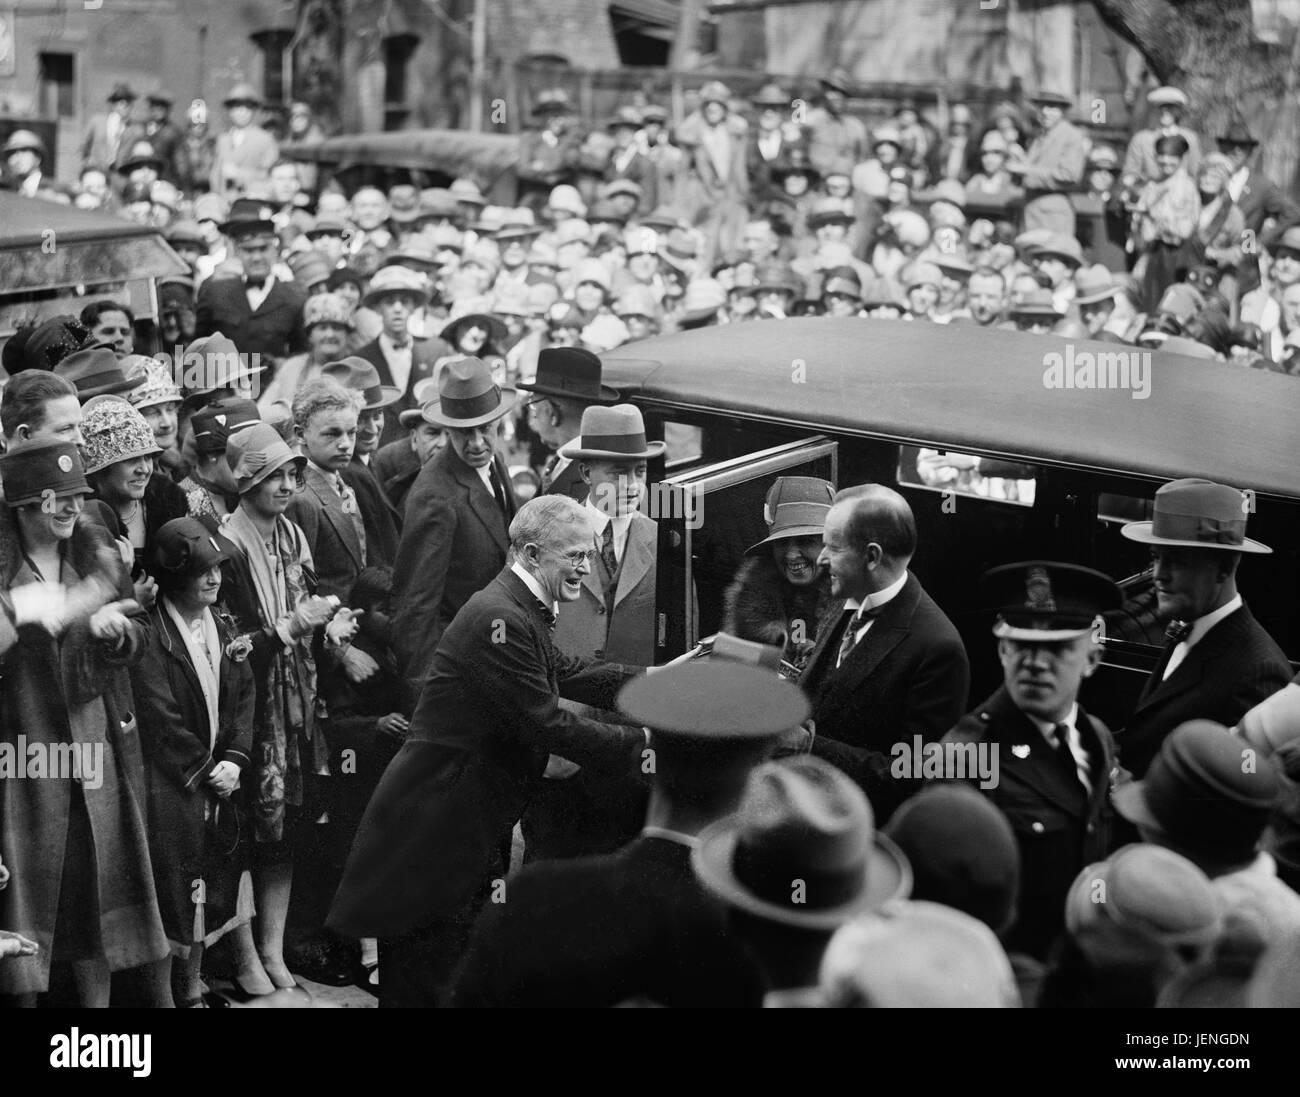 President Calvin Coolidge and his Wife, Grace, Exiting Automobile, Washington DC, USA, Harris & Ewing, April 1927 Stock Photo